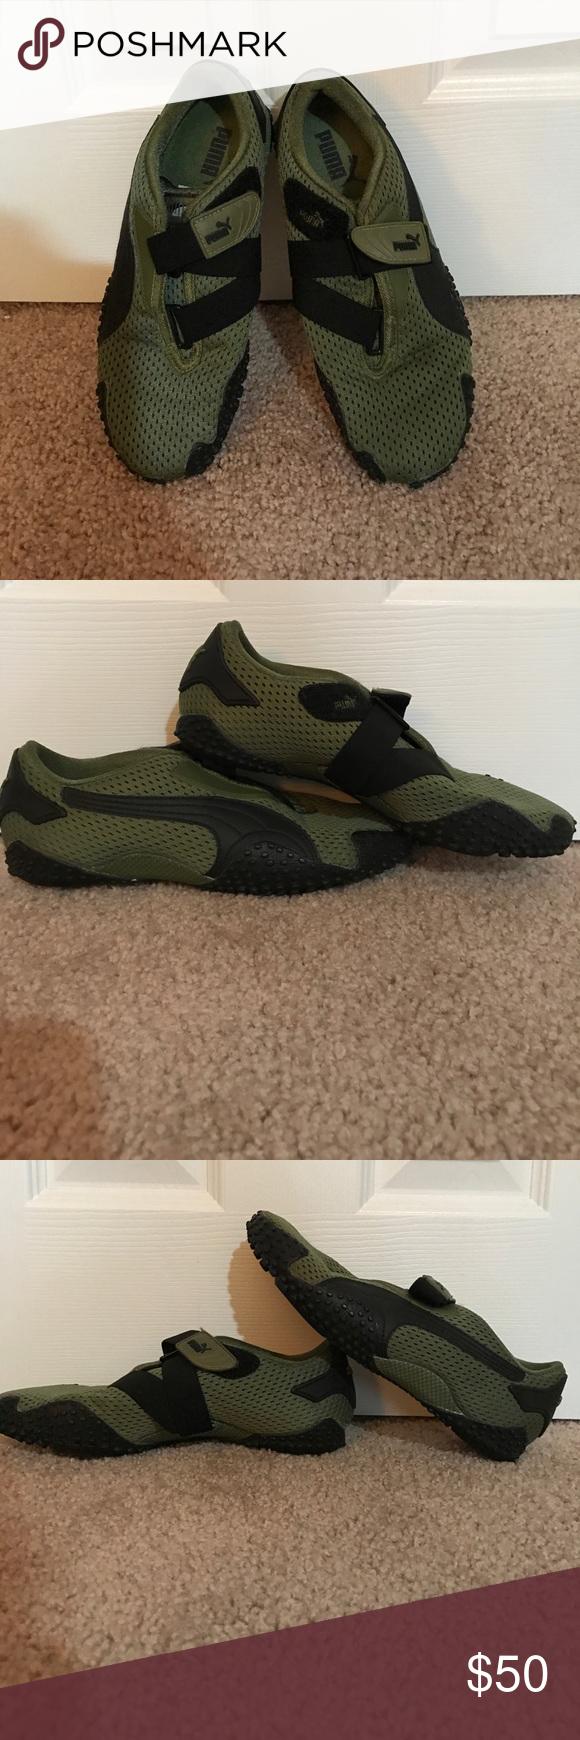 Black Closet Puma Sneakers Green Posh My Olive Velcro Txx4qZf